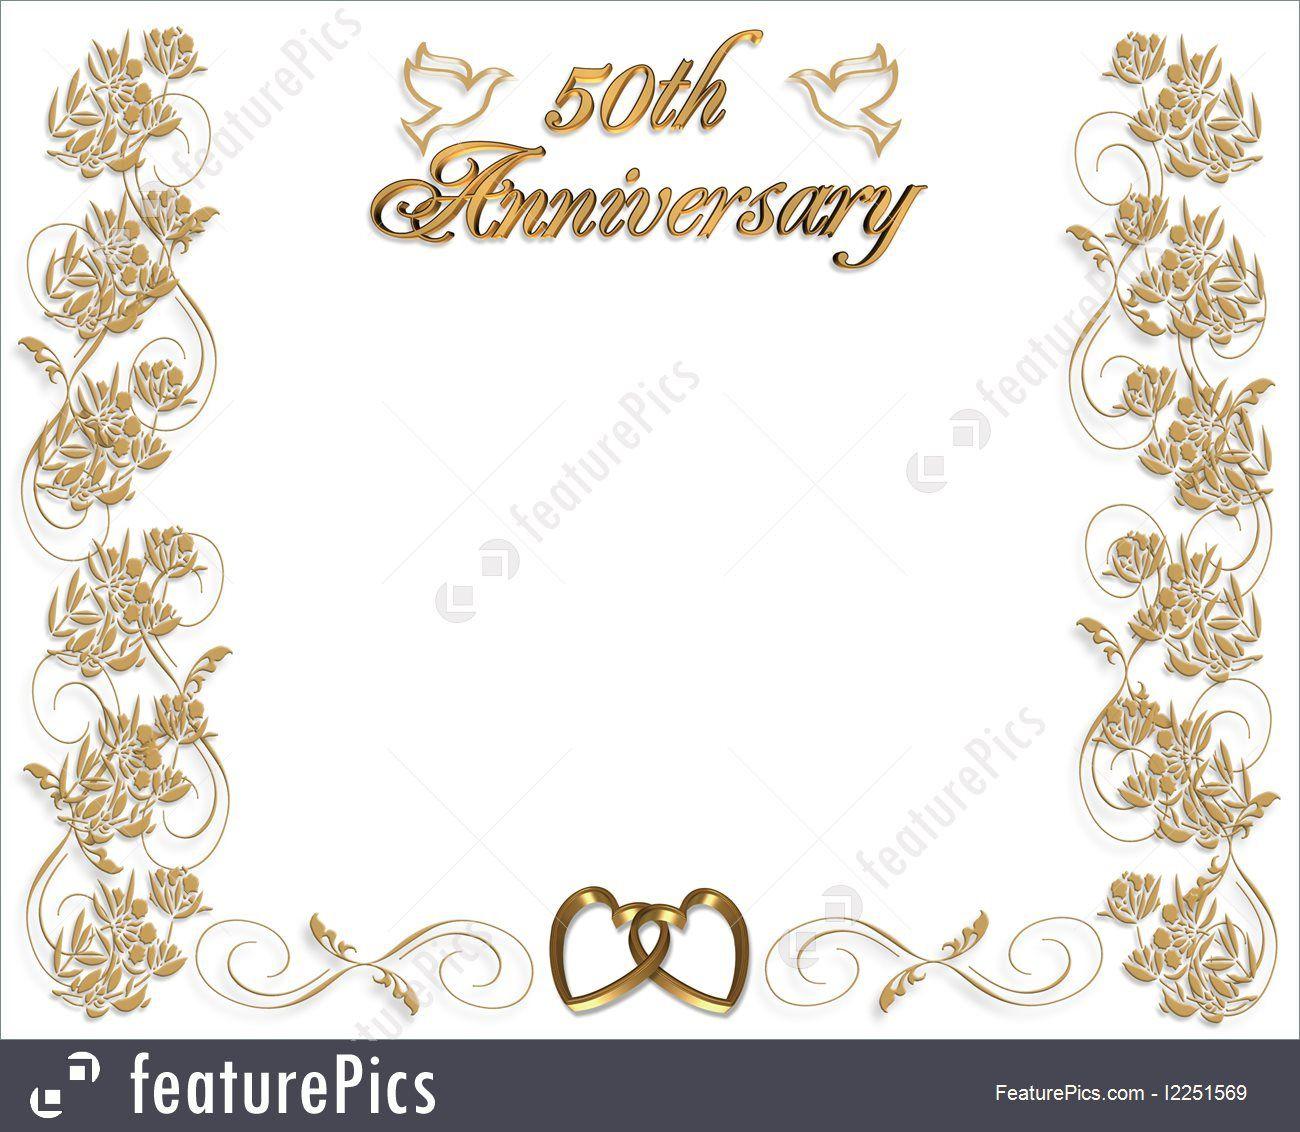 009 Fantastic 50th Wedding Anniversary Invitation Template Concept  Templates Card Sample GoldenFull